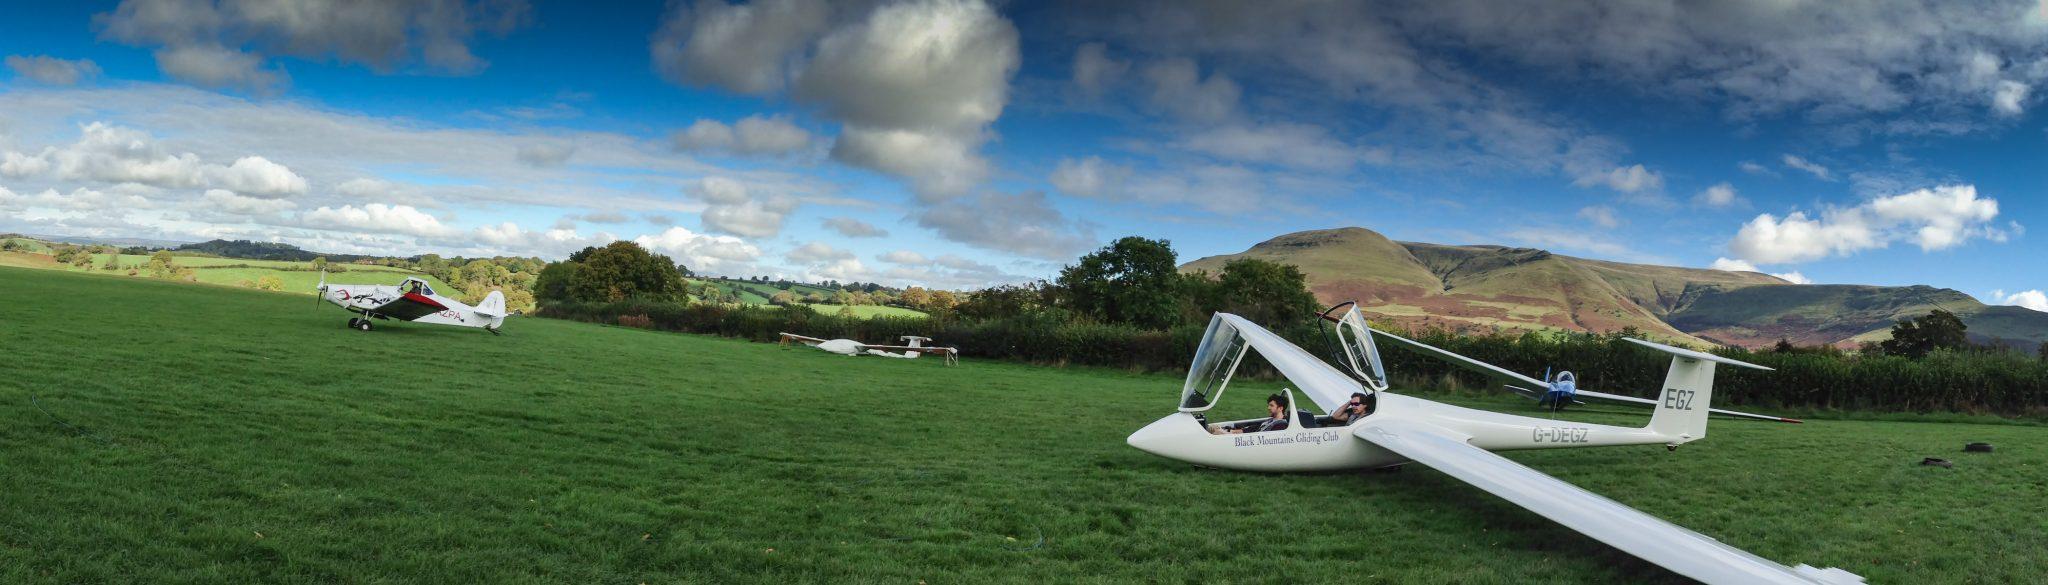 Black Mountains Gliding Club